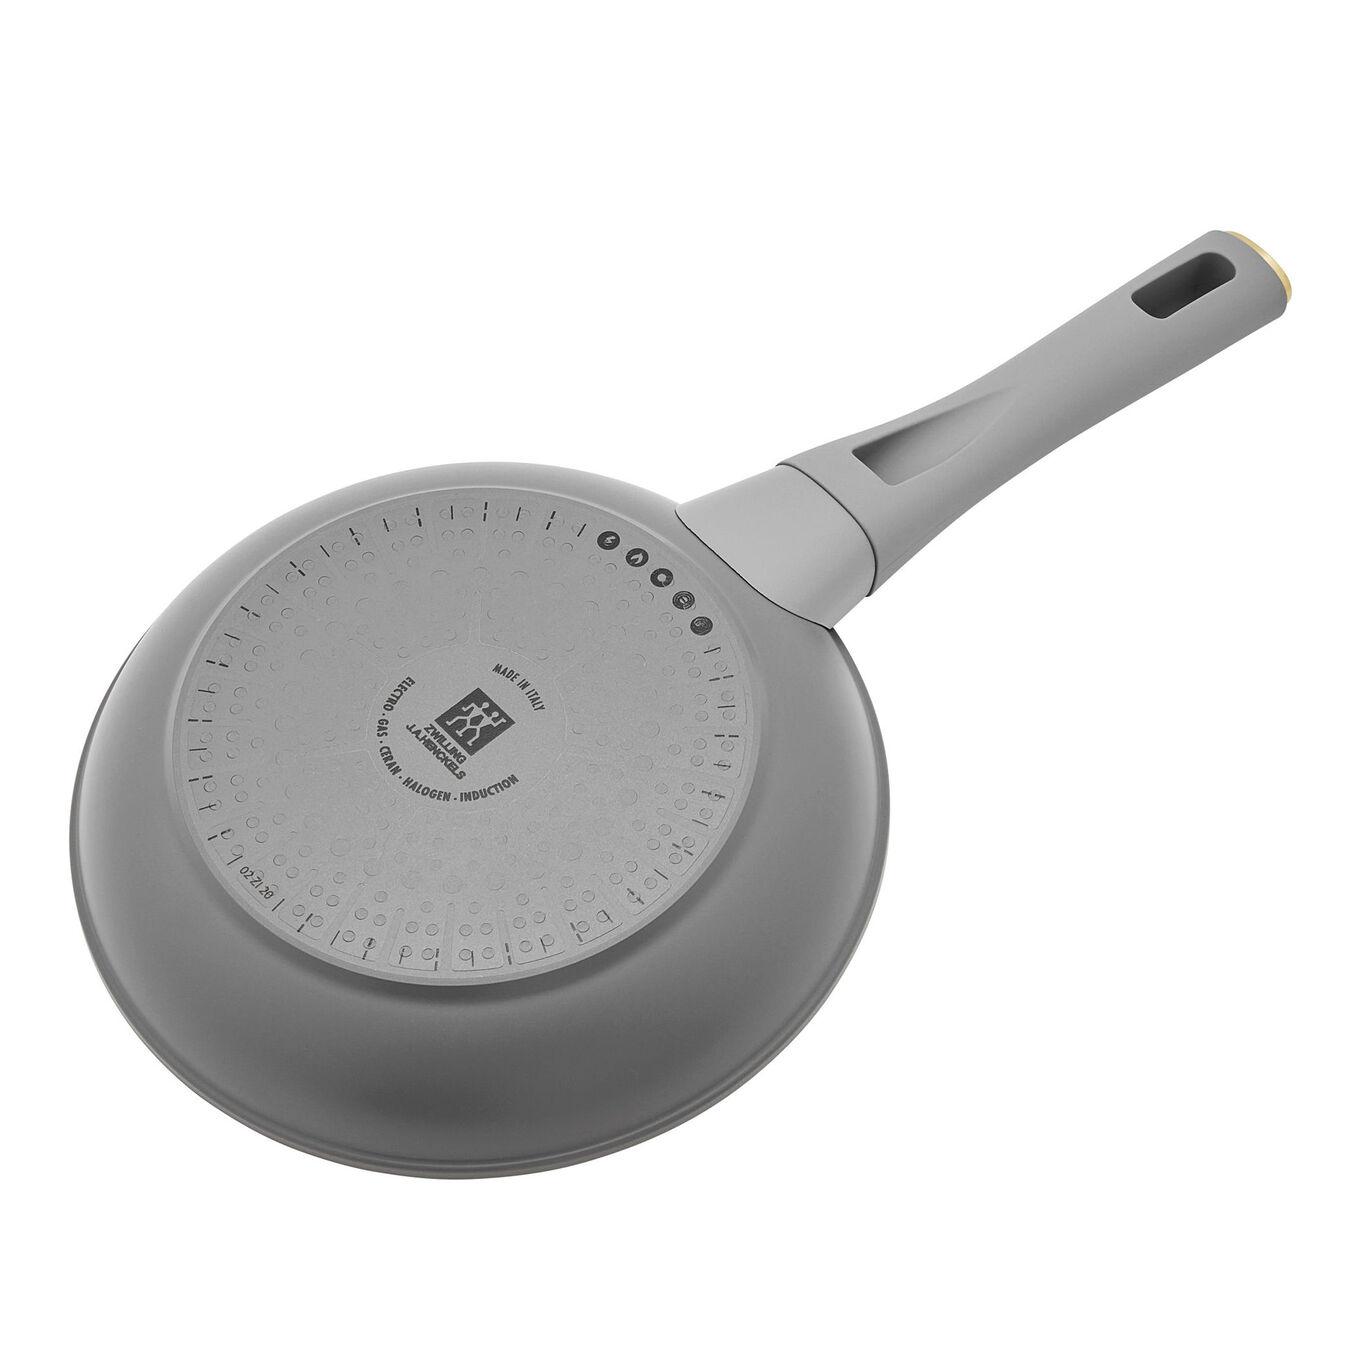 20 cm / 8 inch Frying pan,,large 3